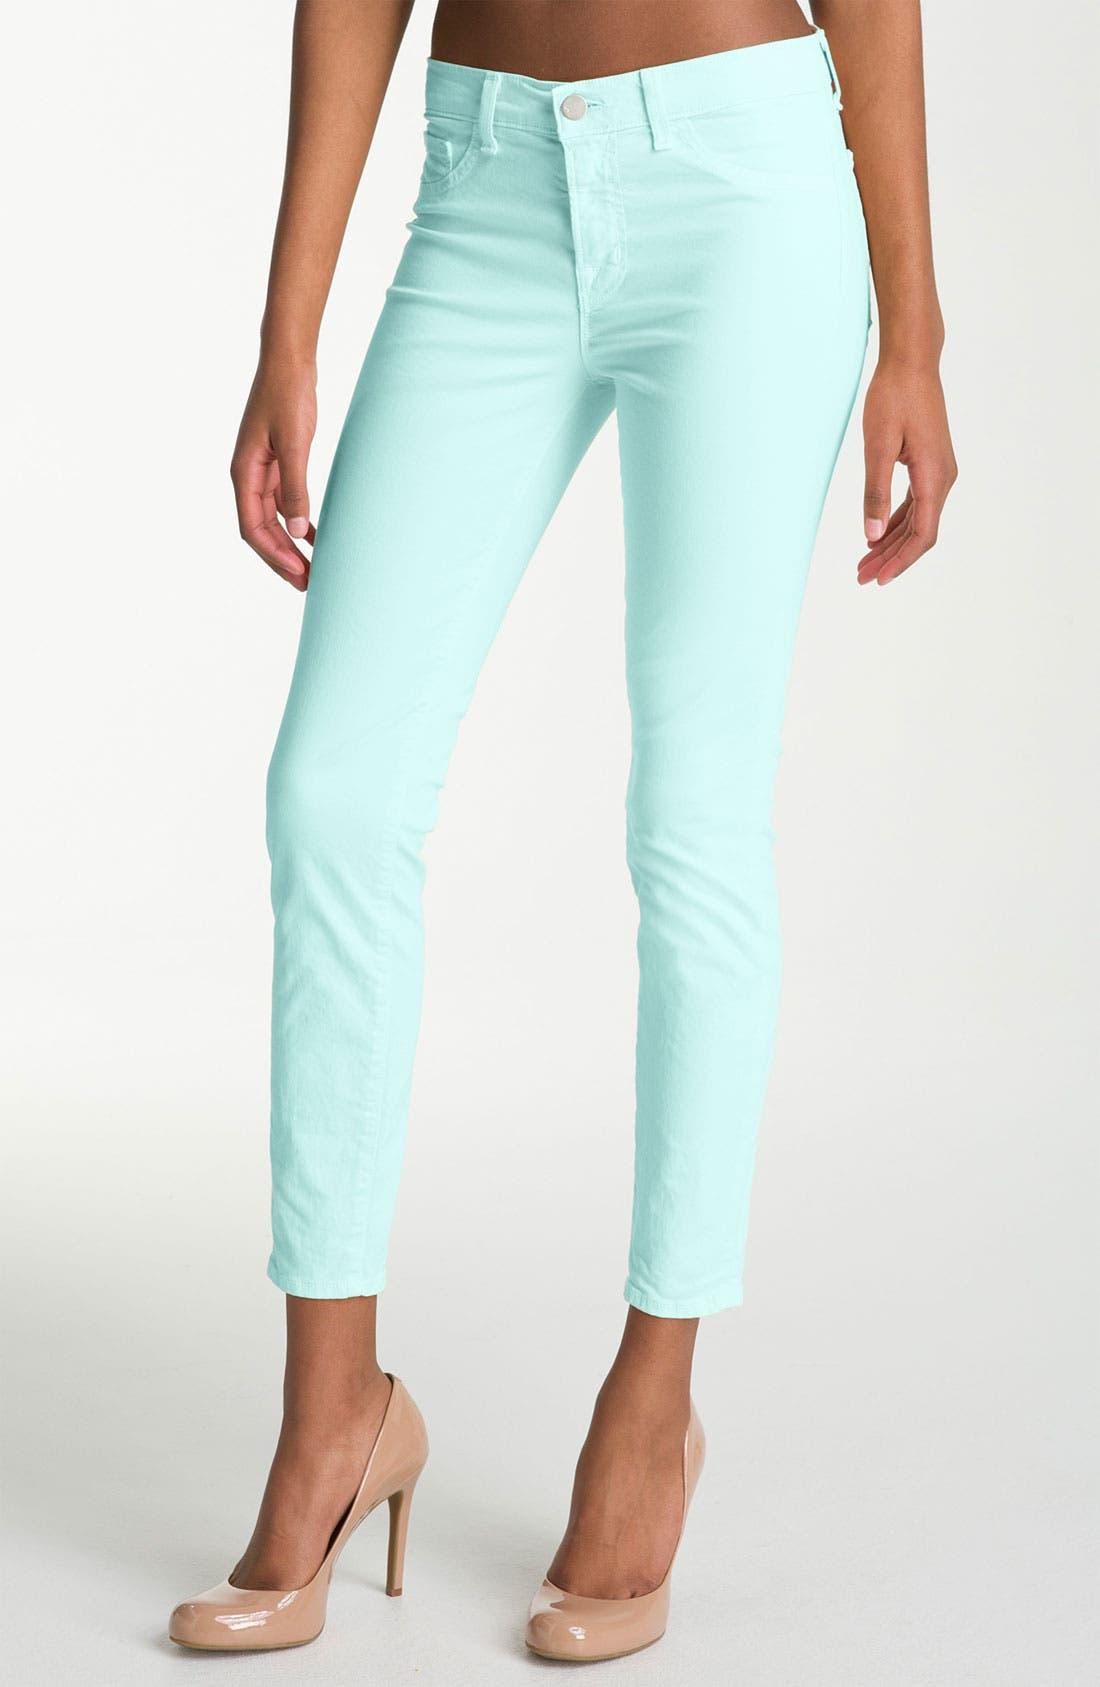 Alternate Image 1 Selected - J Brand Overdyed Skinny Jeans